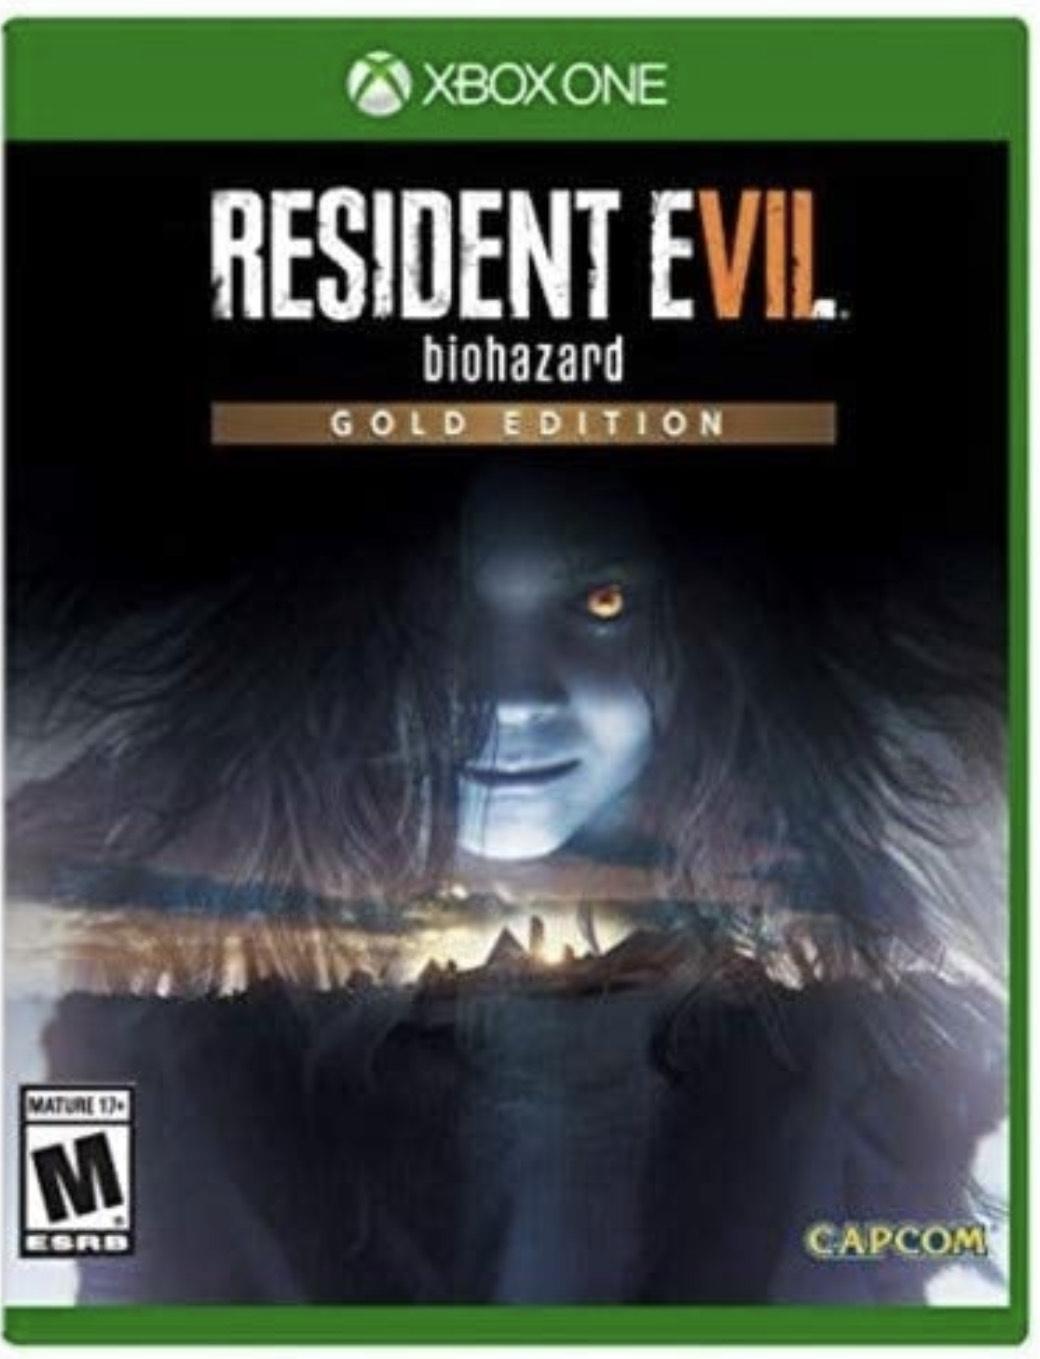 Amazon: Resident Evil 7: Biohazard - Gold Edition - Xbox One